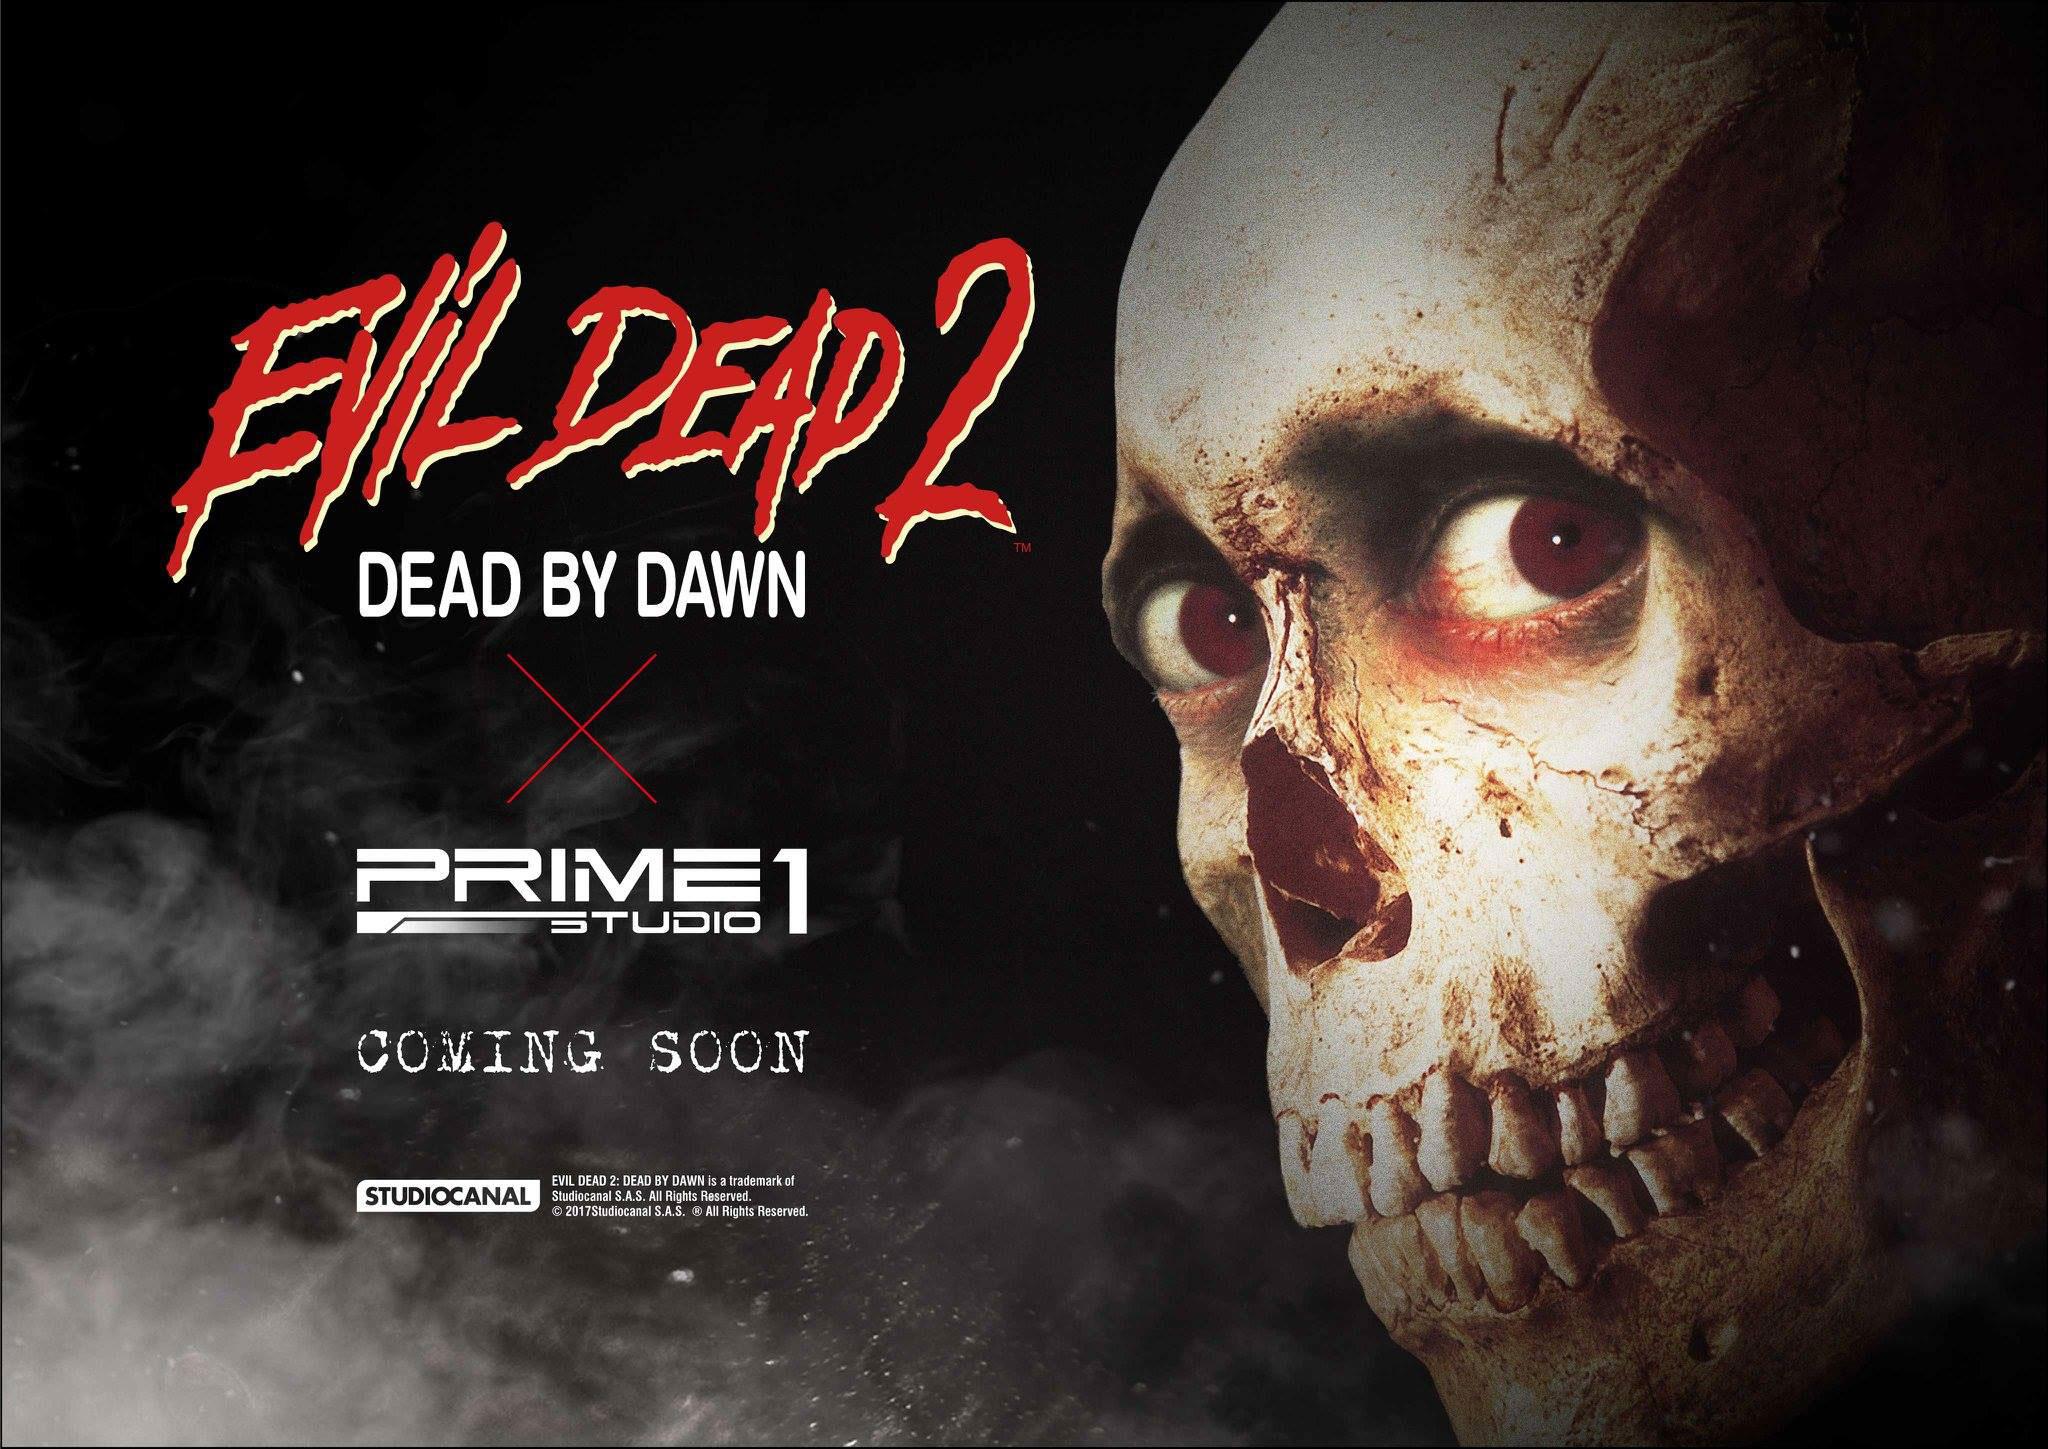 prime-1-studio-evil-dead-2-statues-preview